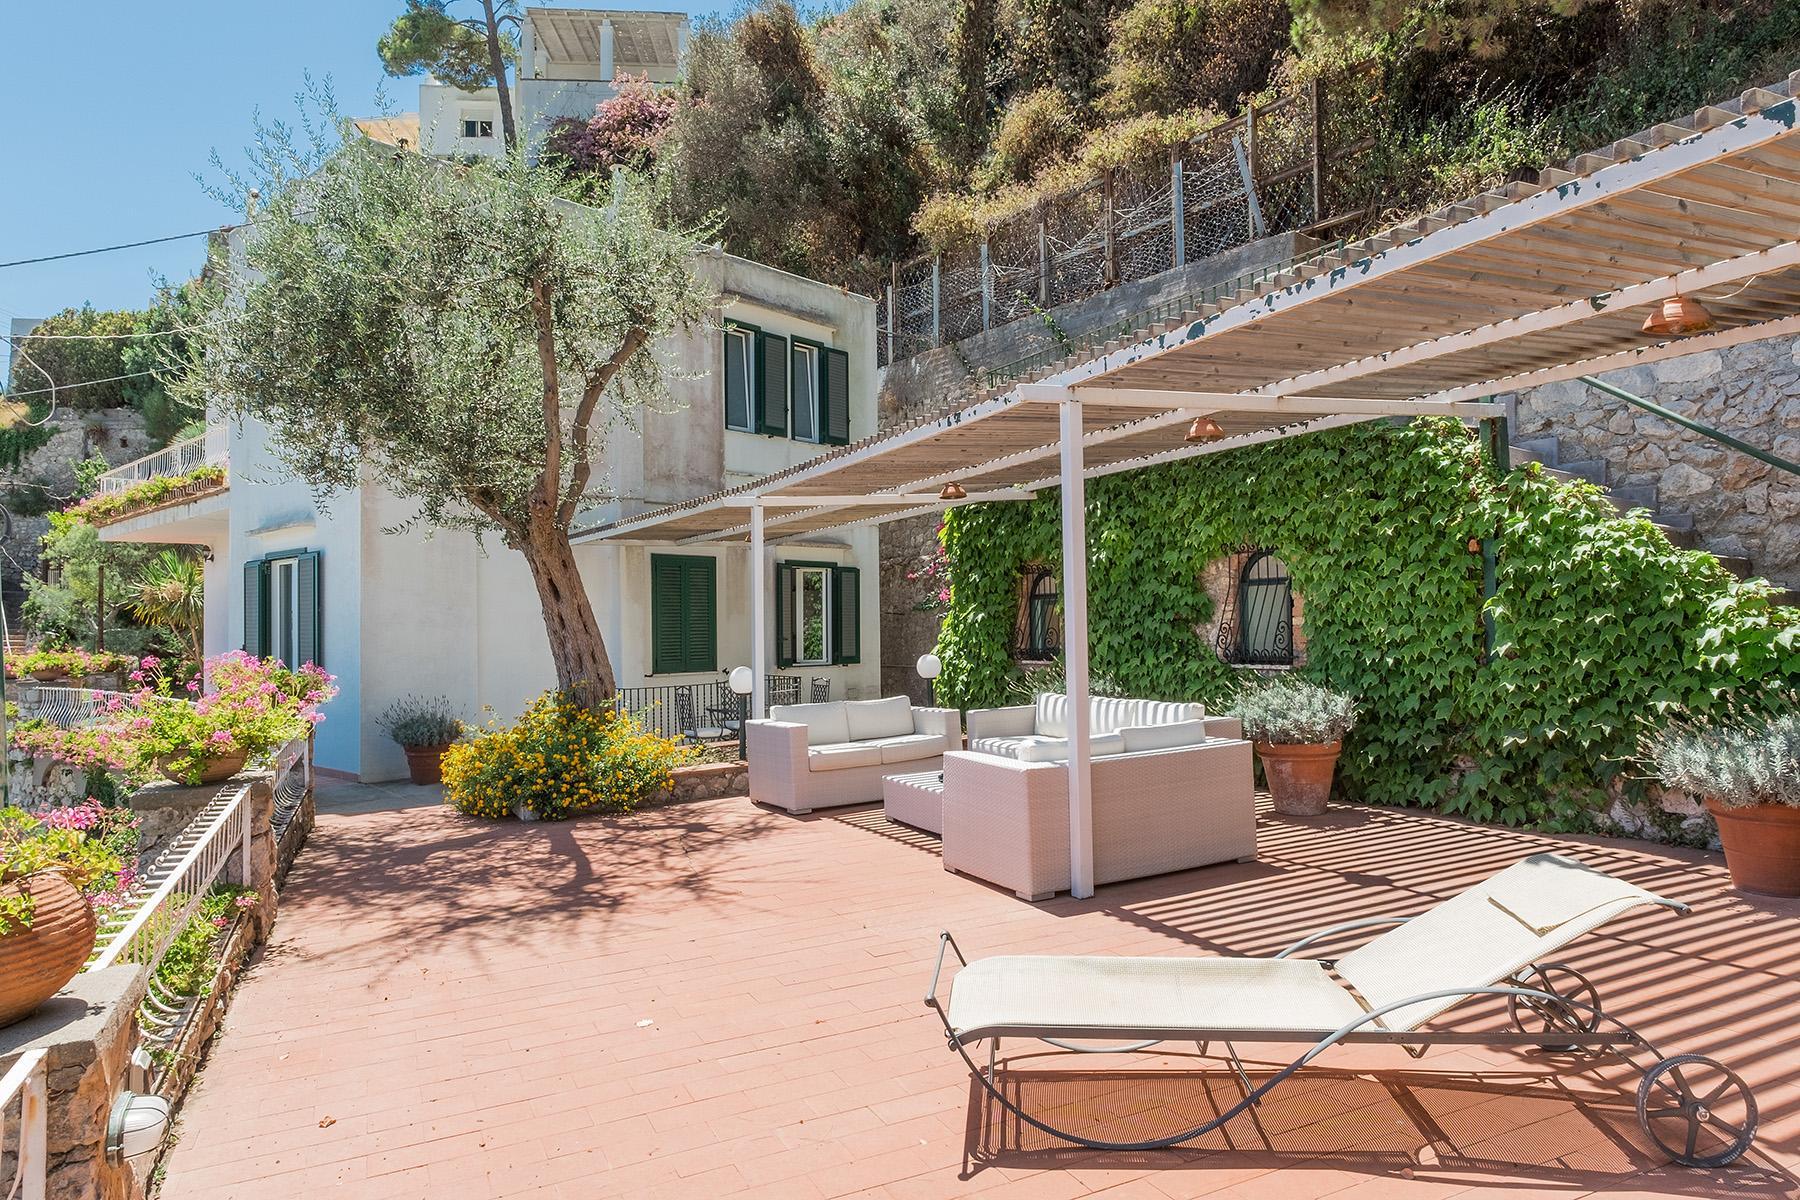 Прекрасная вилла с панорамным видом на море в центре легендарного острова Капри, Италия - 4